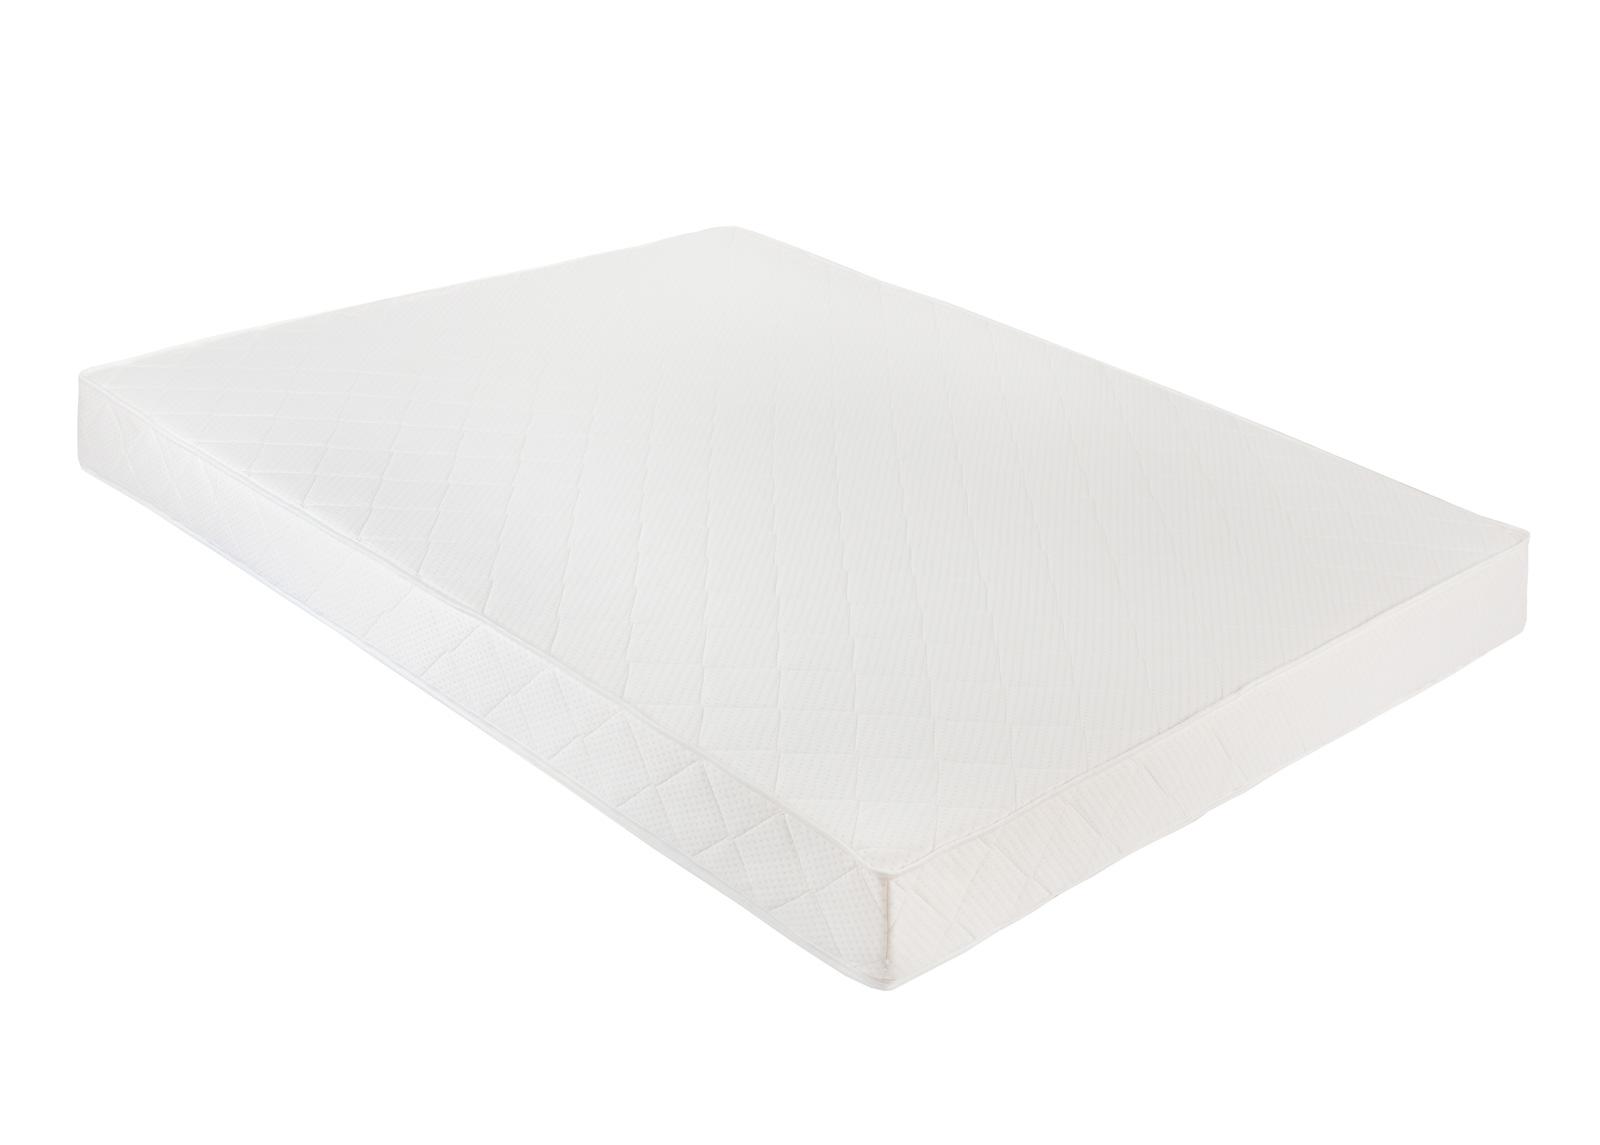 Joustinpatja Pocket 140x200 cm